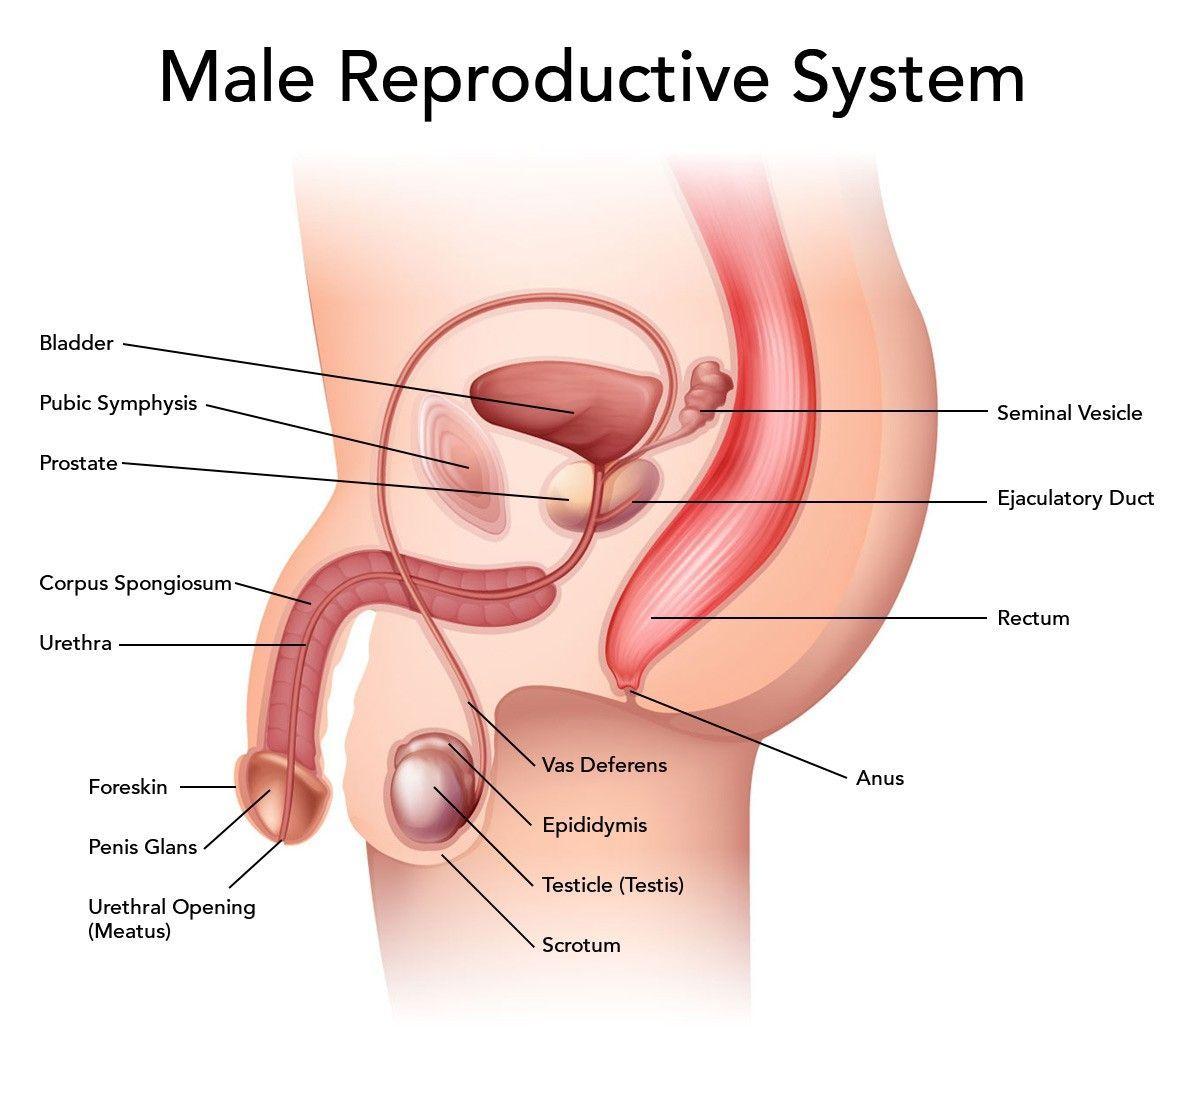 Male Female Anatomy Diagrams Human Anatomy Drawing Reproductive